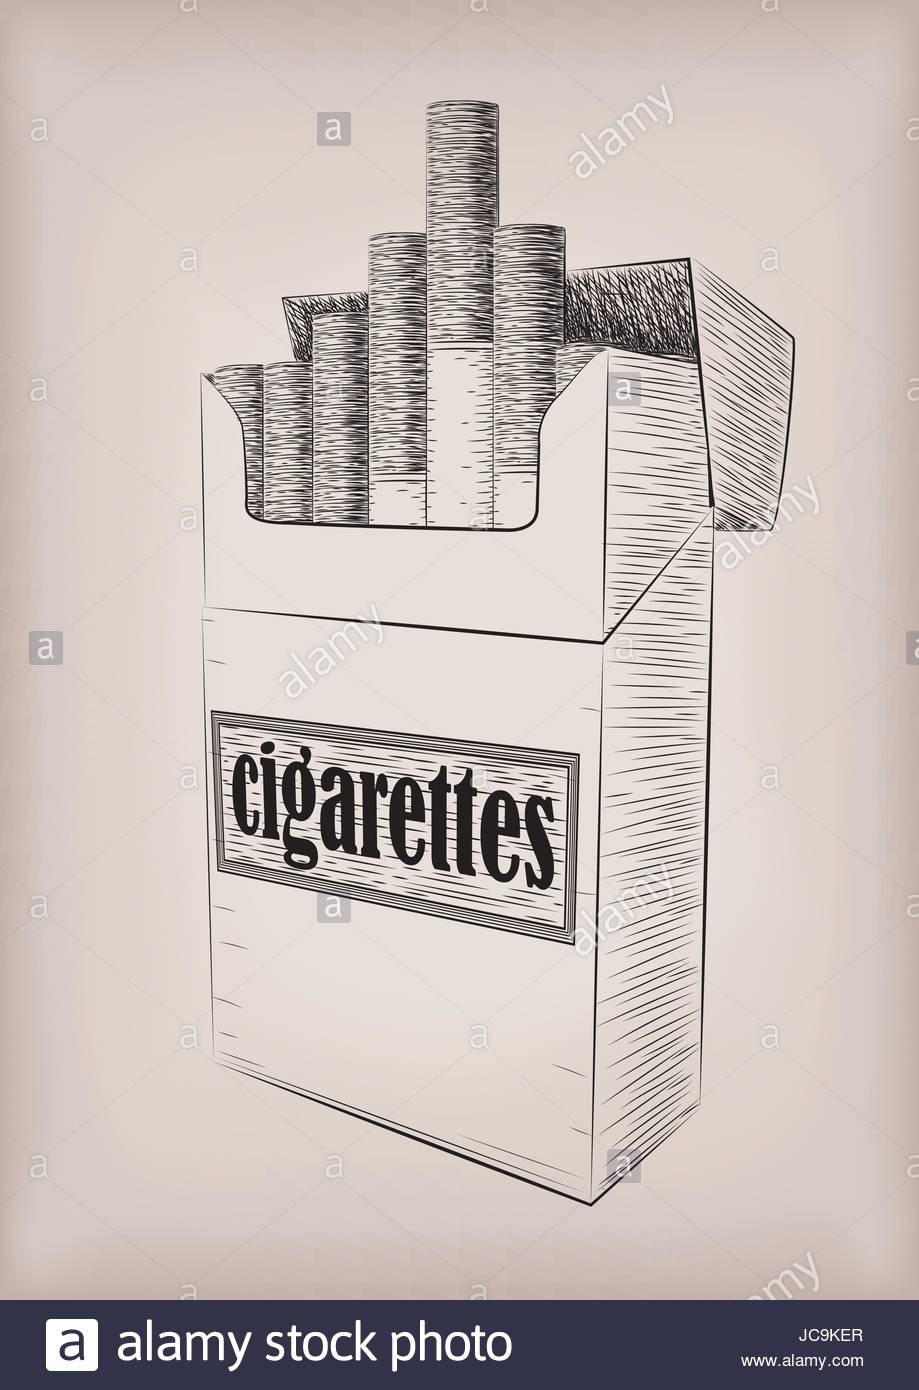 919x1390 Cigarettes Cigarette Pack Cardboard Box Full Smoking Sign